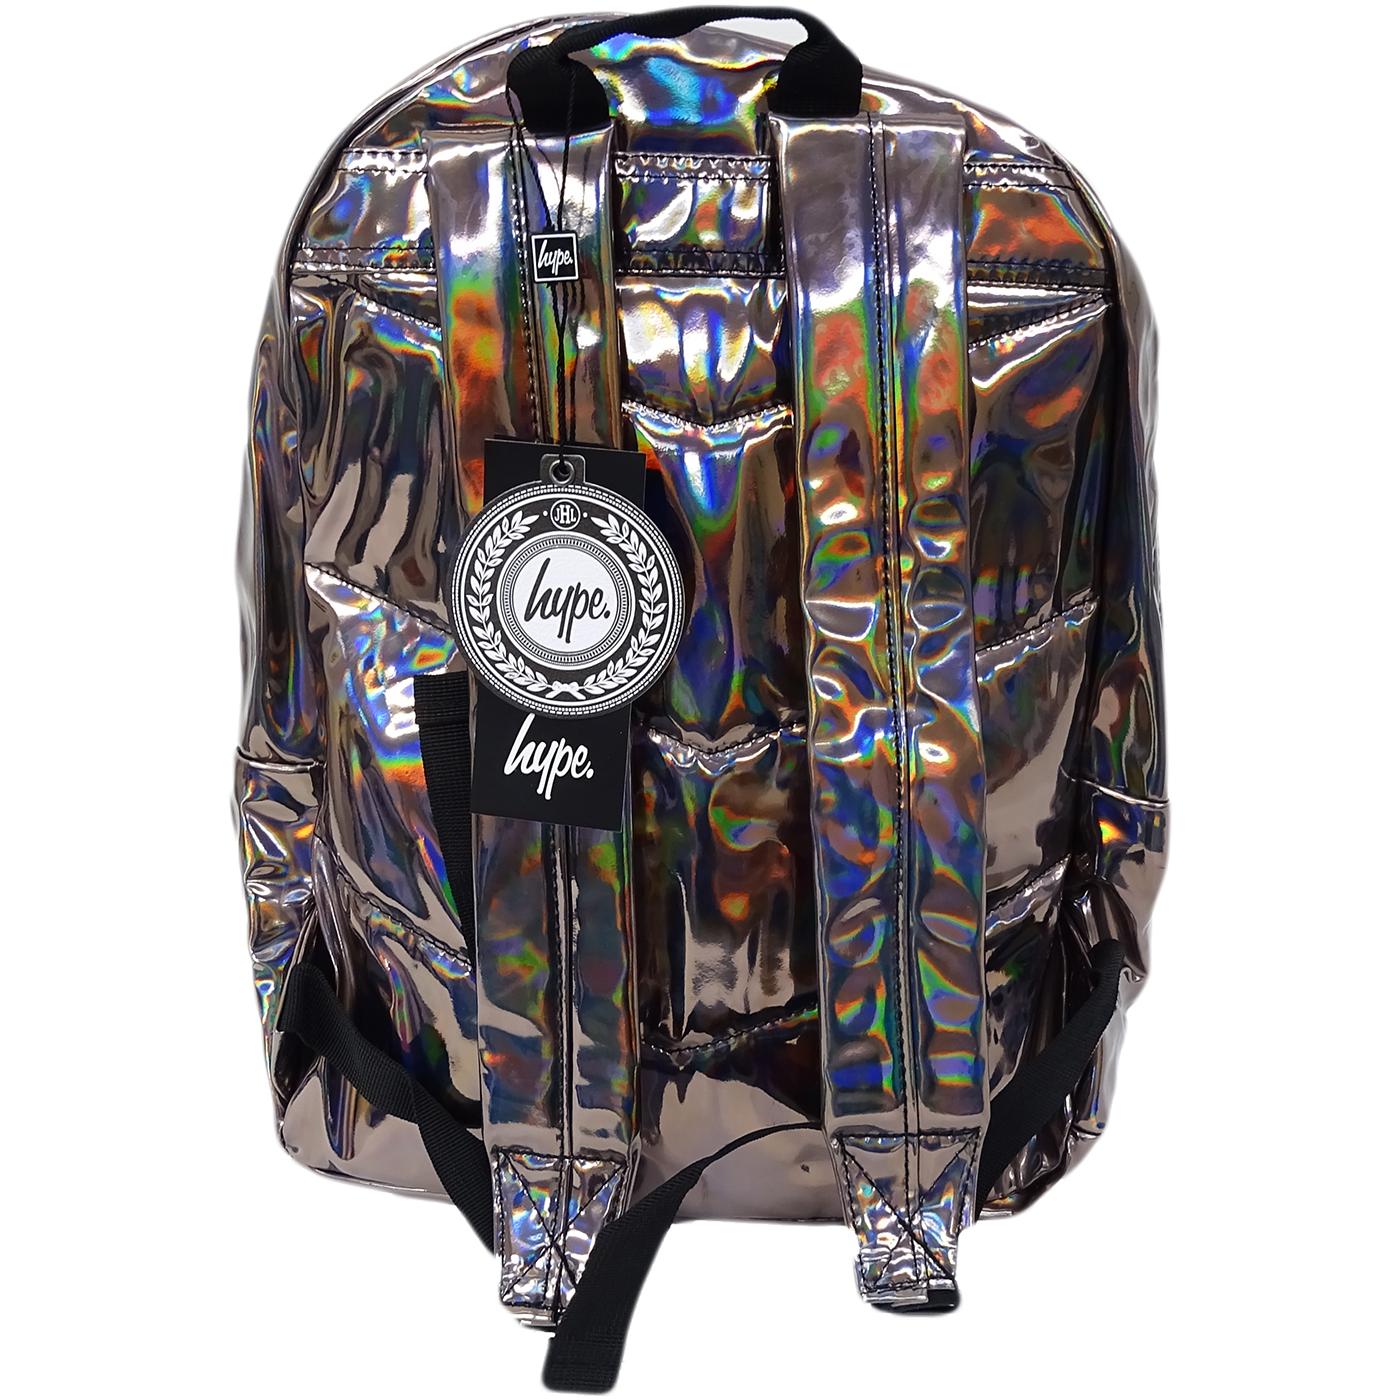 bd5308eb4e1c Boys Hype Backpack Rucksack Bag - Boys   Girls Bags